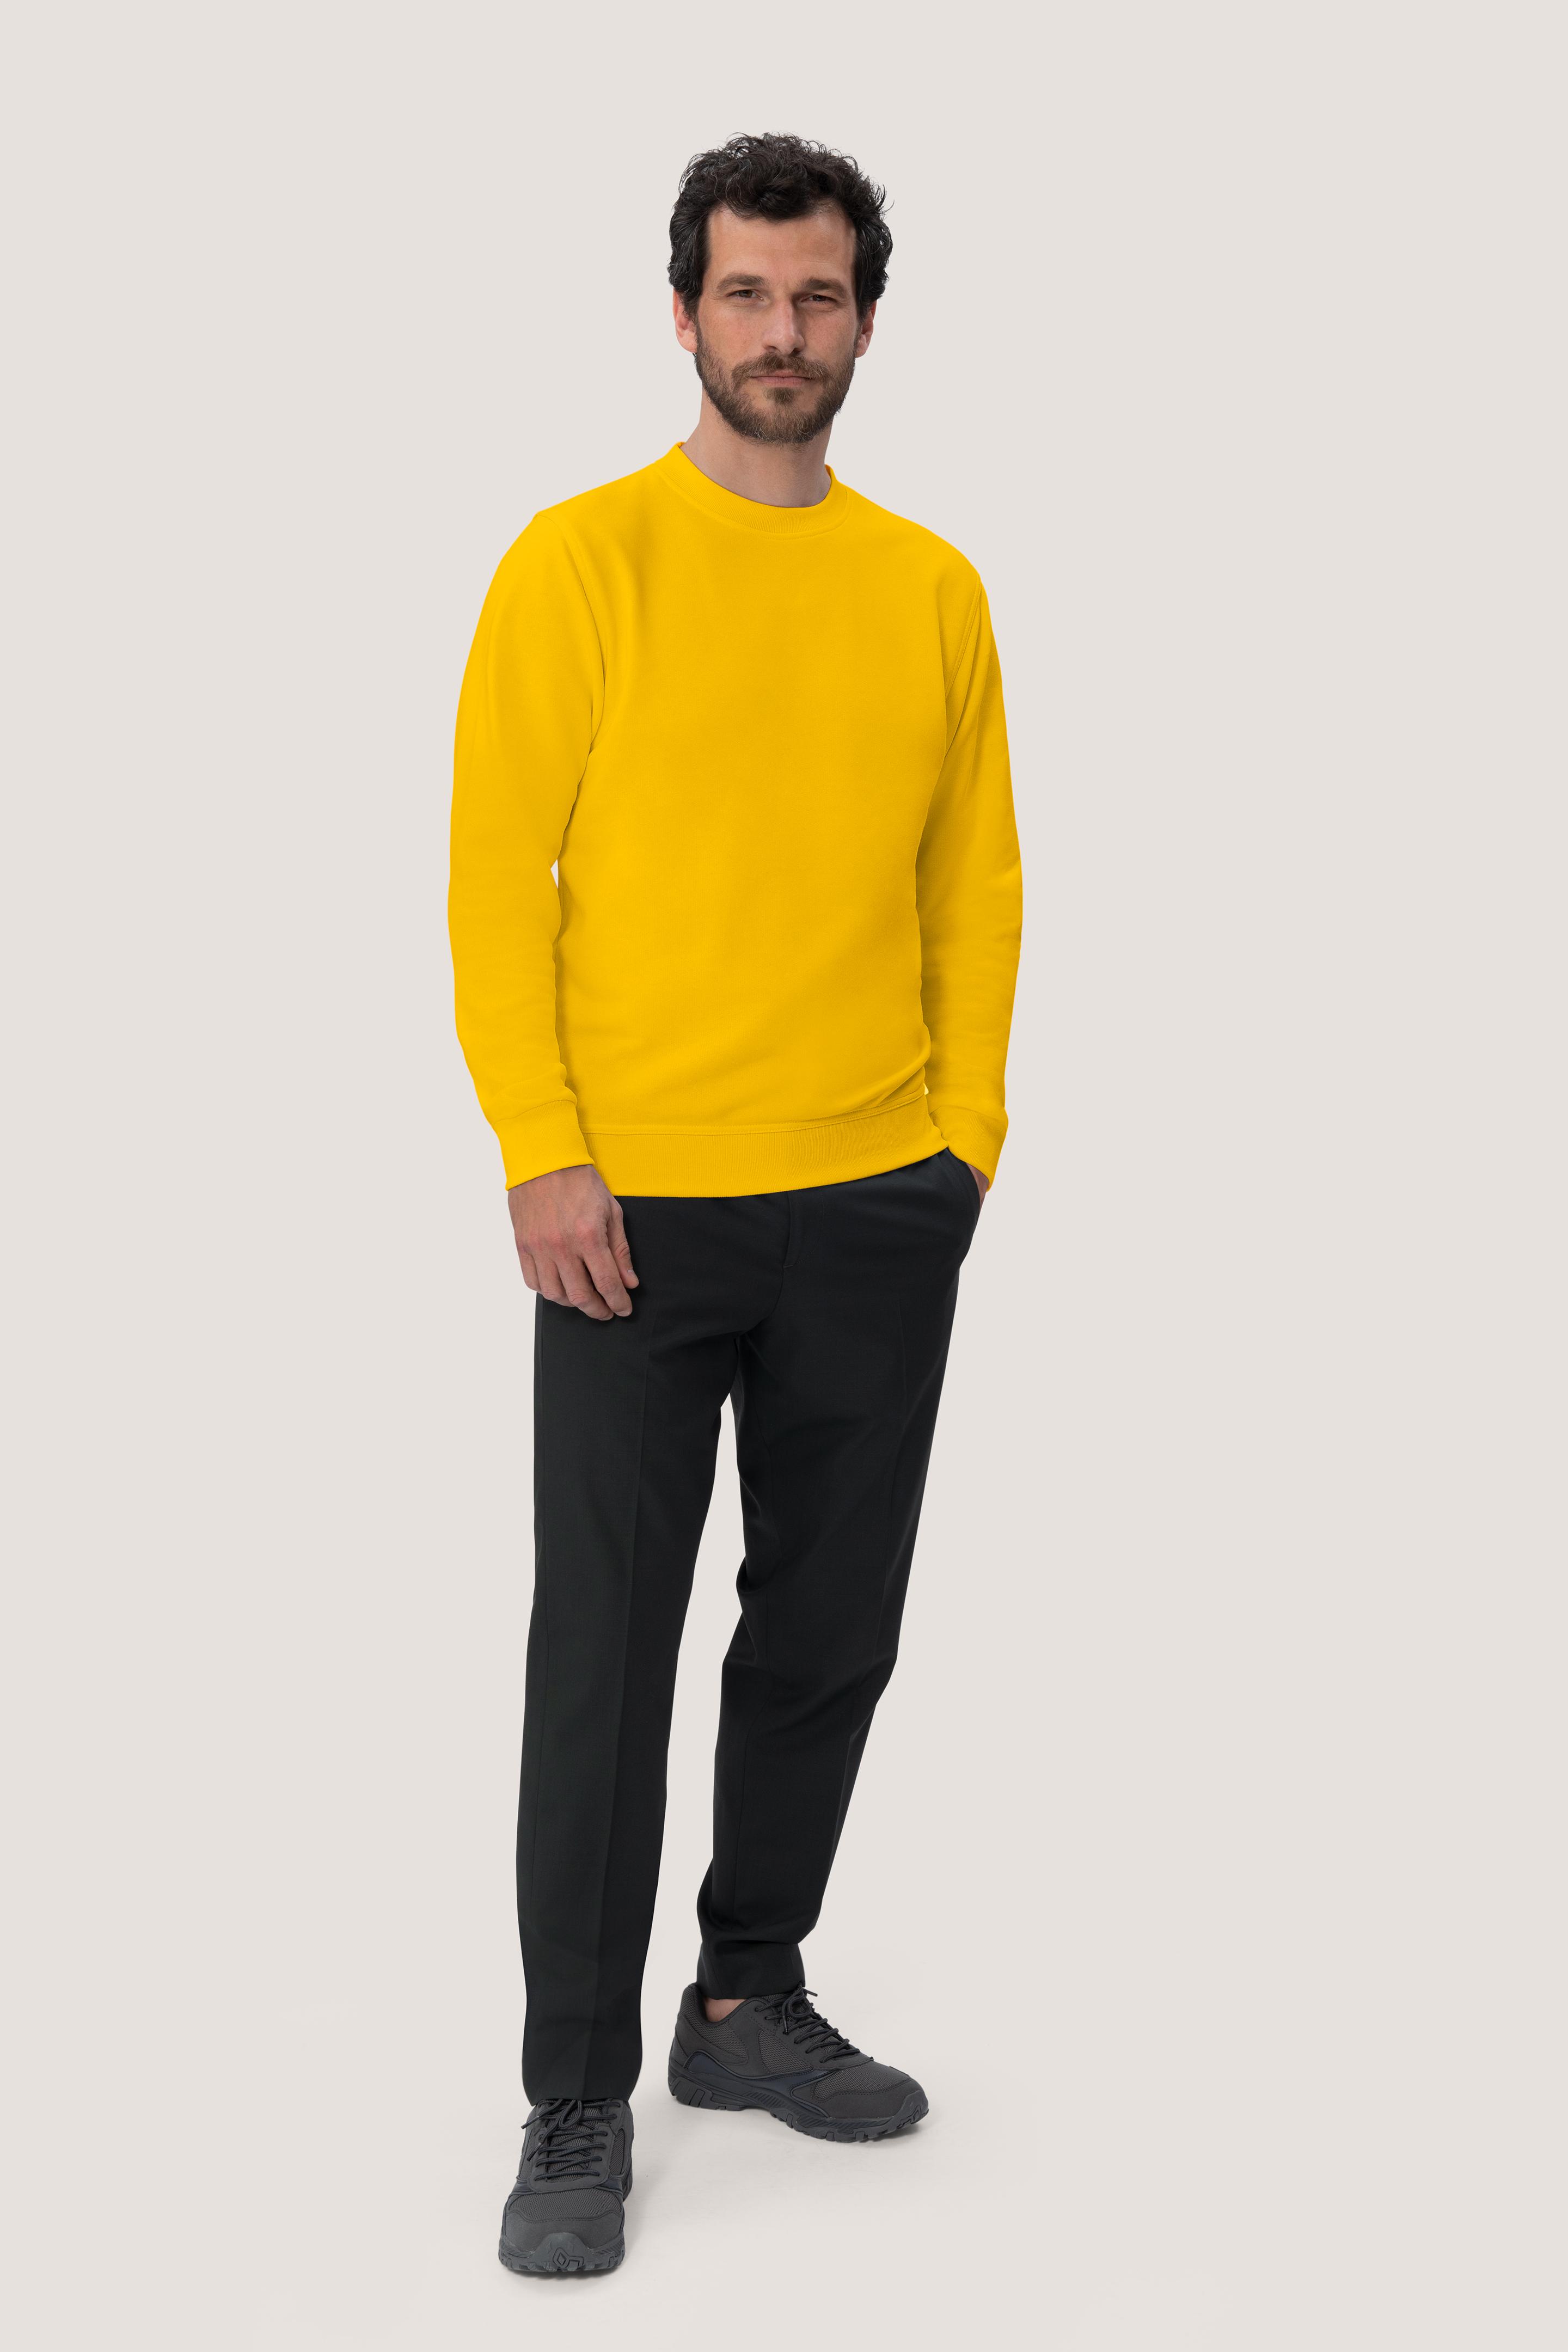 Sweatshirt MIKRALINAR® von Hakro No. 475